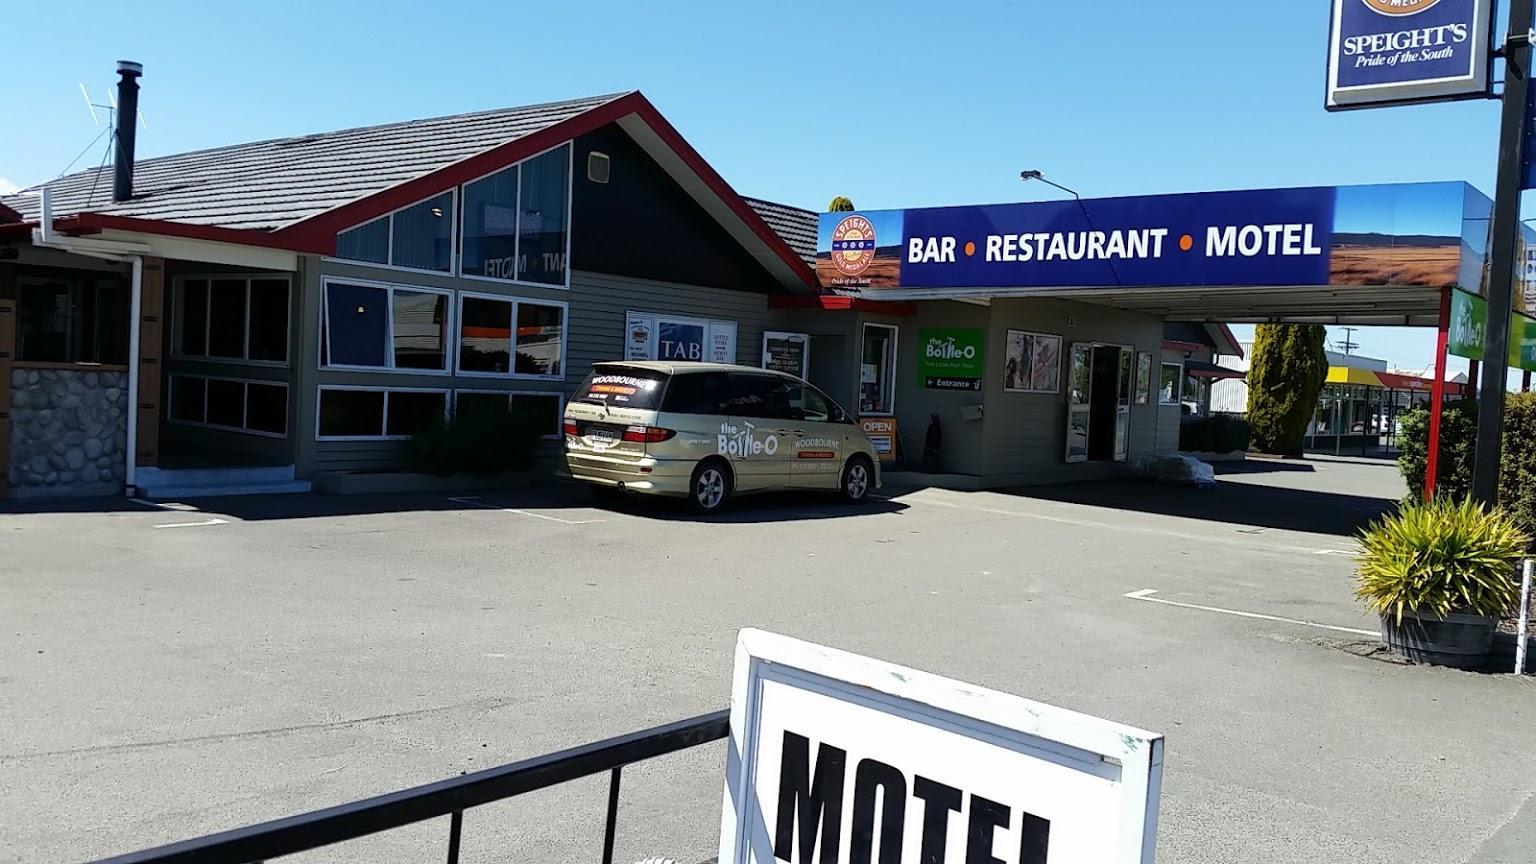 Woodbourne Tavern & Motels